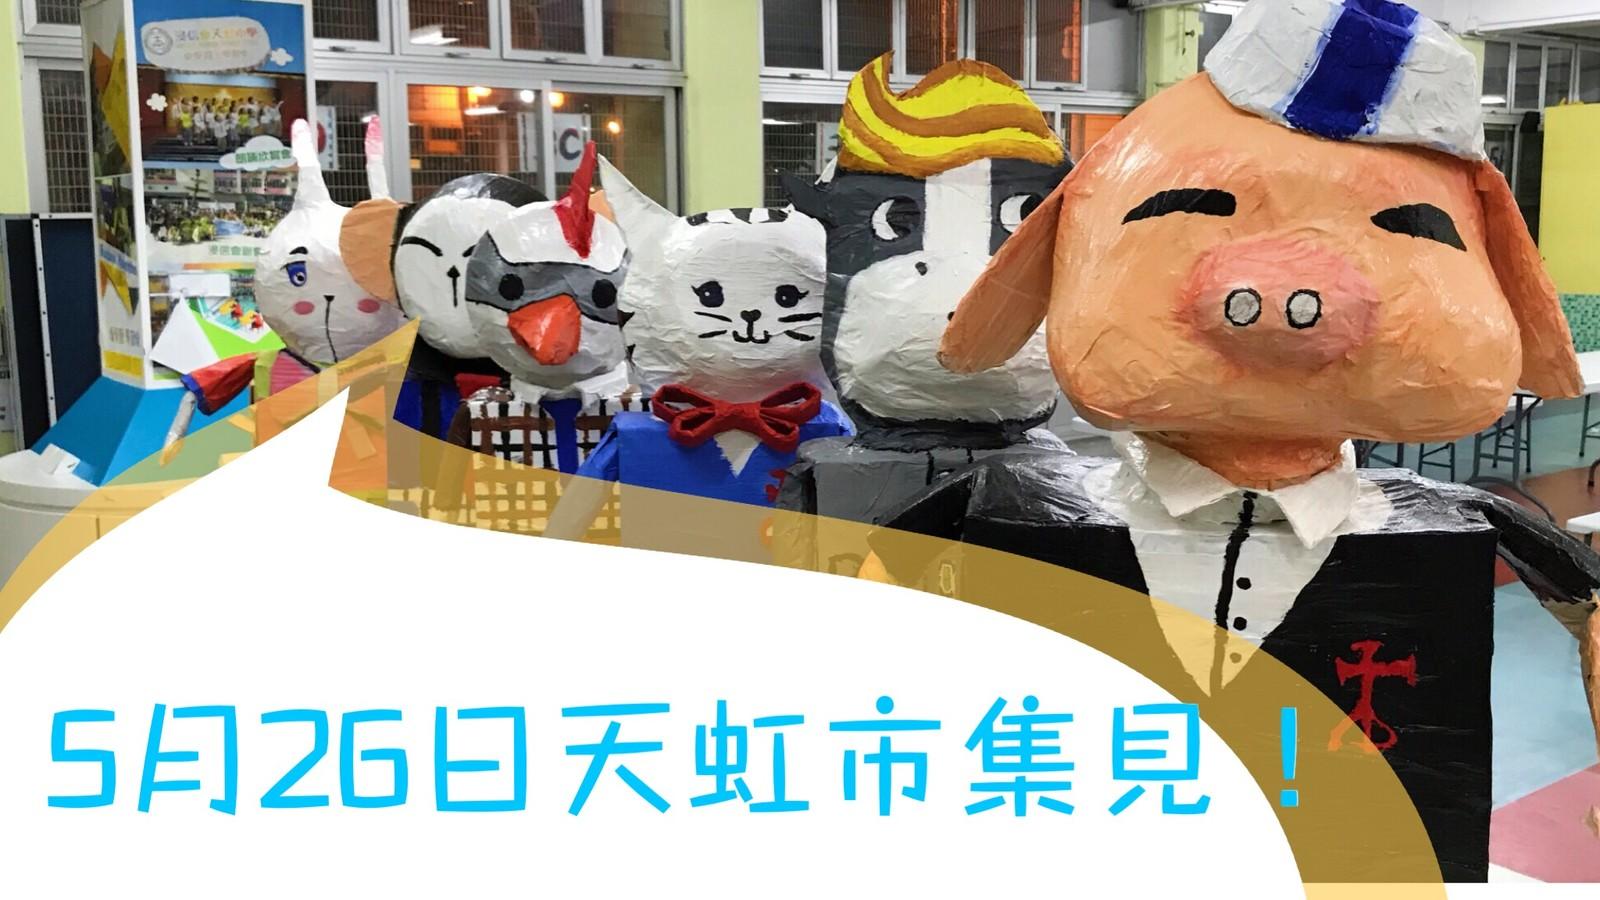 5月26日Rainbow Kidket 天虹市集見!